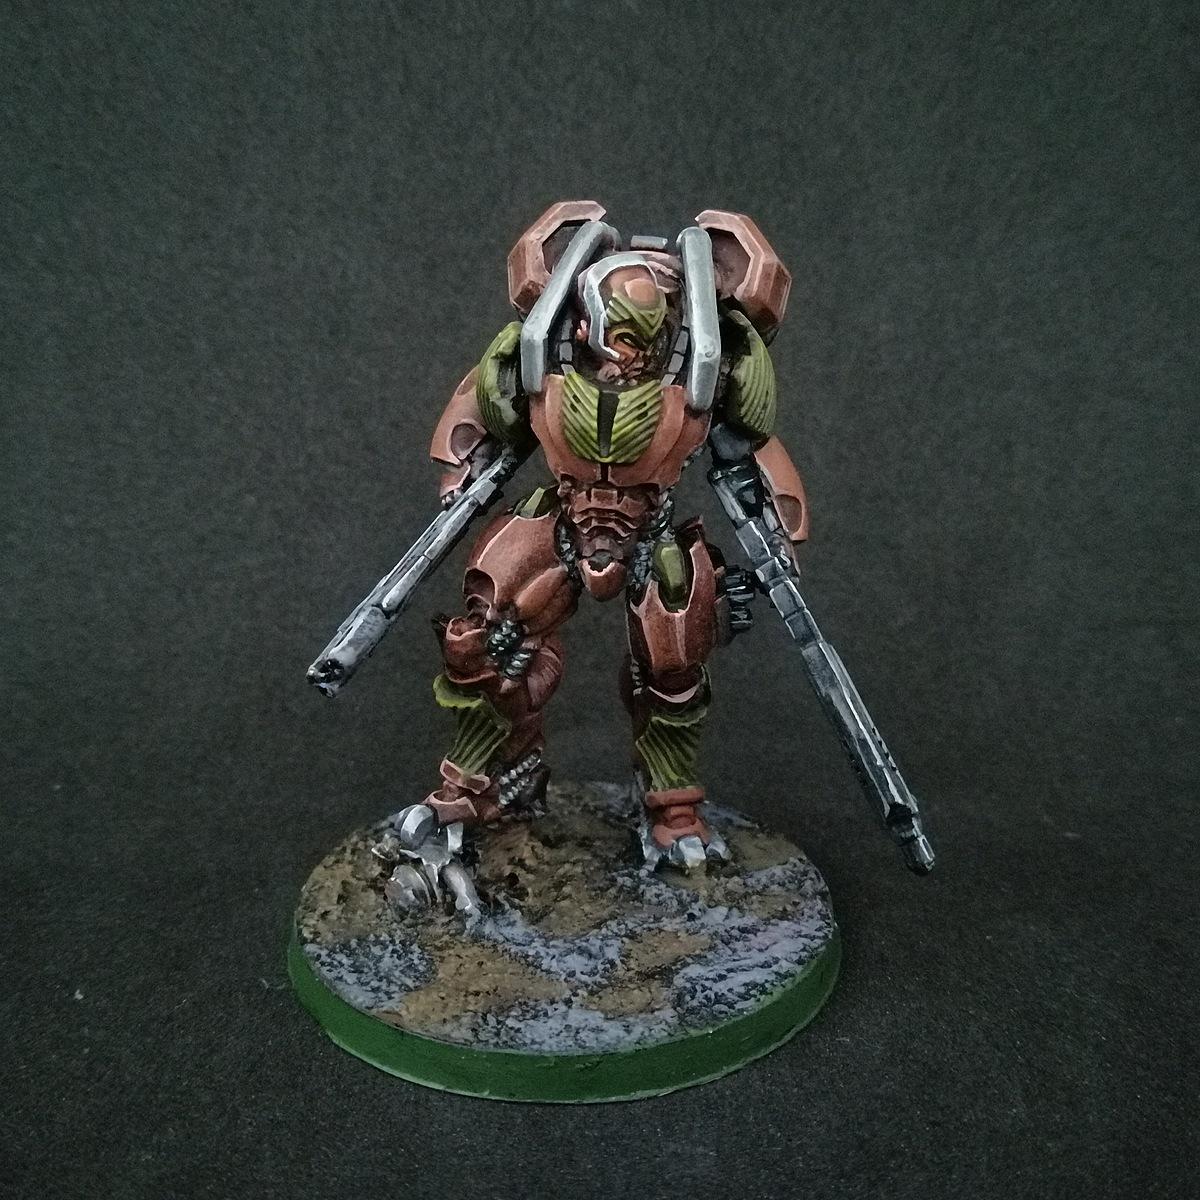 Terracota Armor